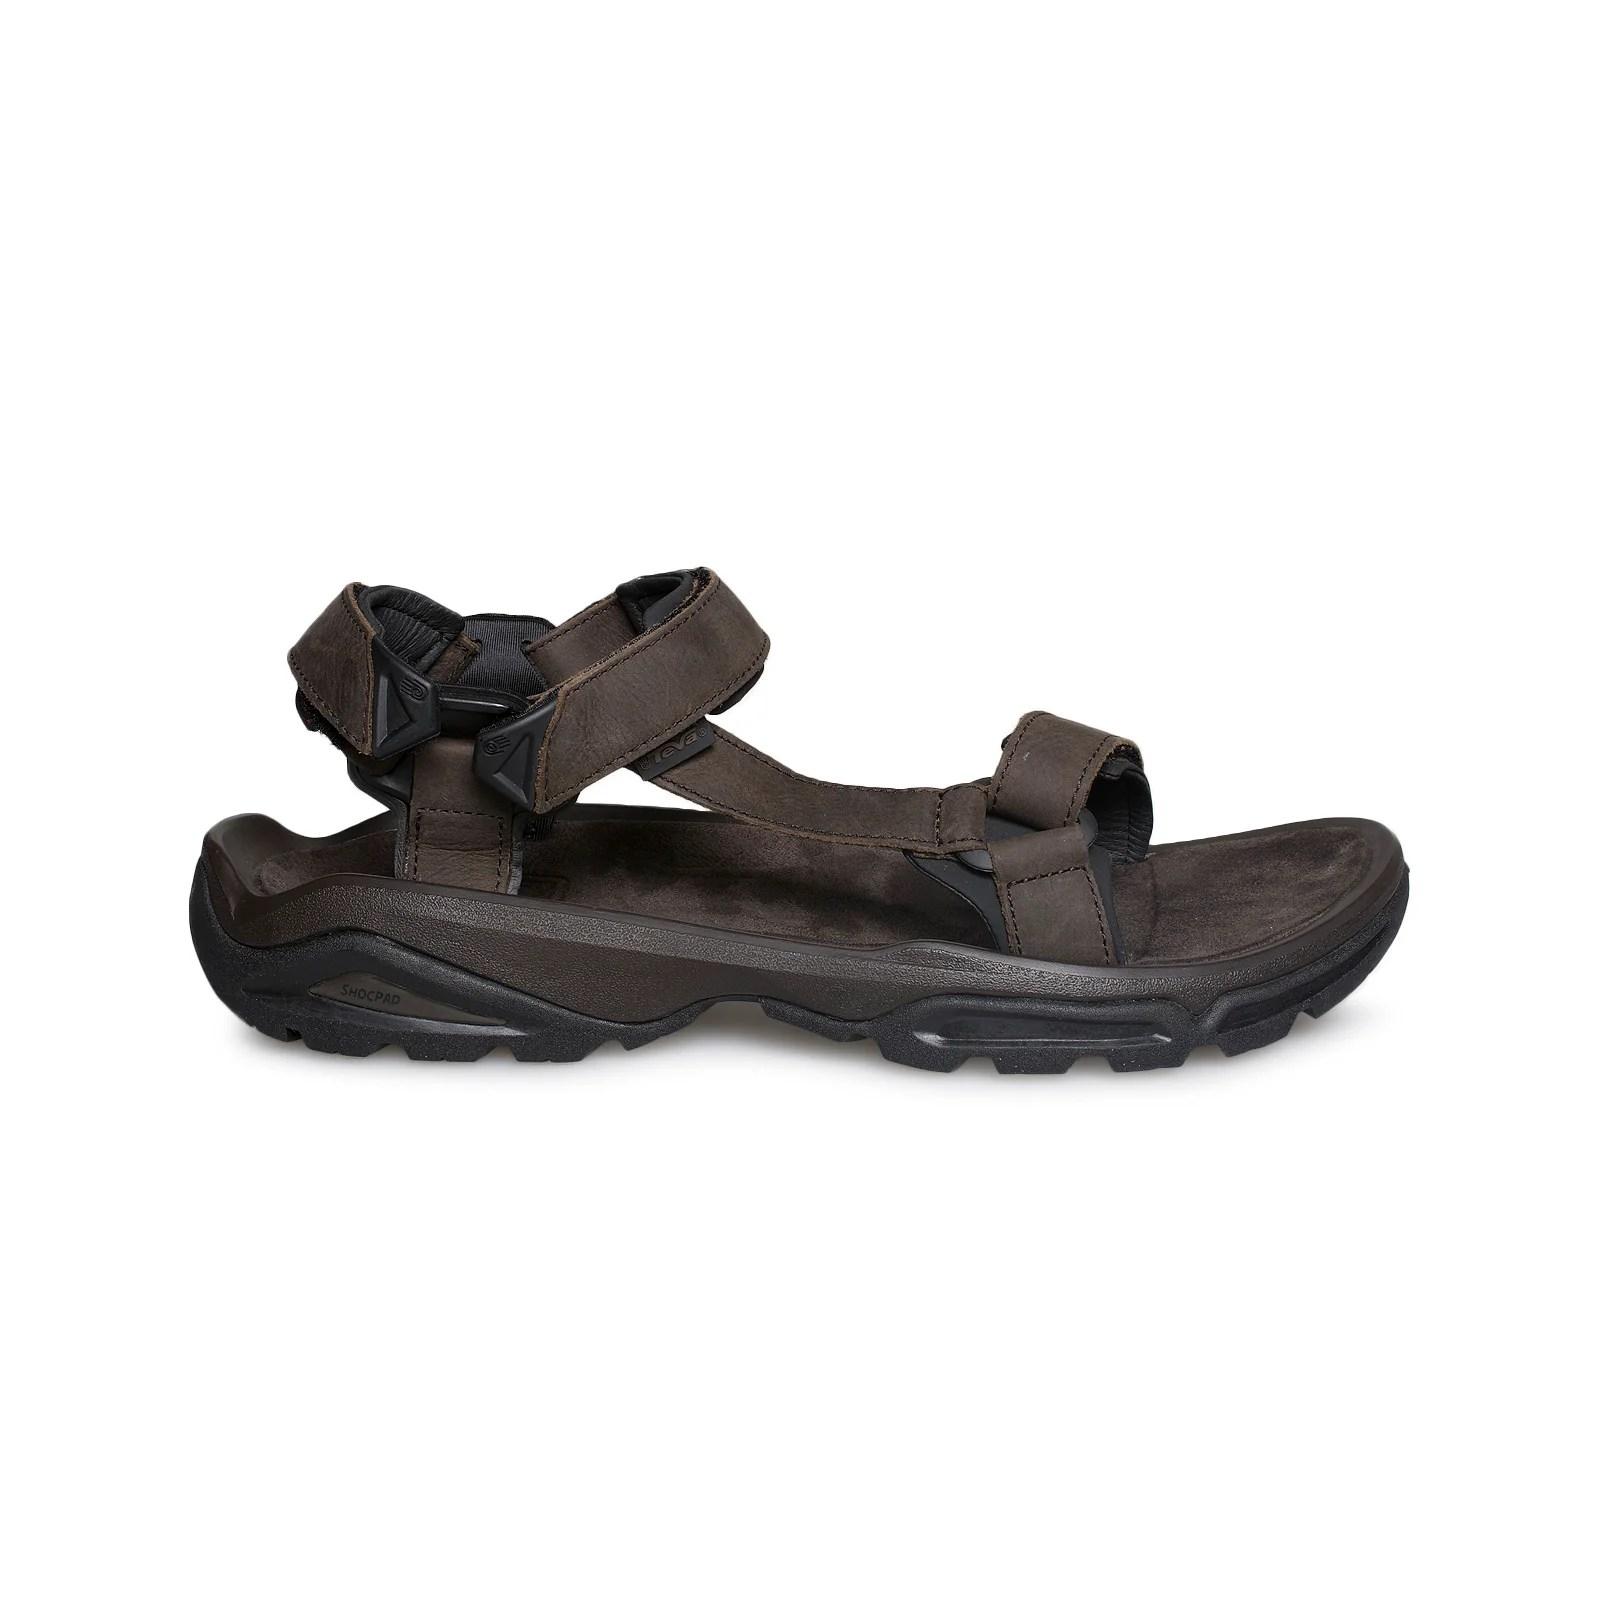 Teva Terra FI 4 Leather Turkish Coffee Sandals - Men's ...